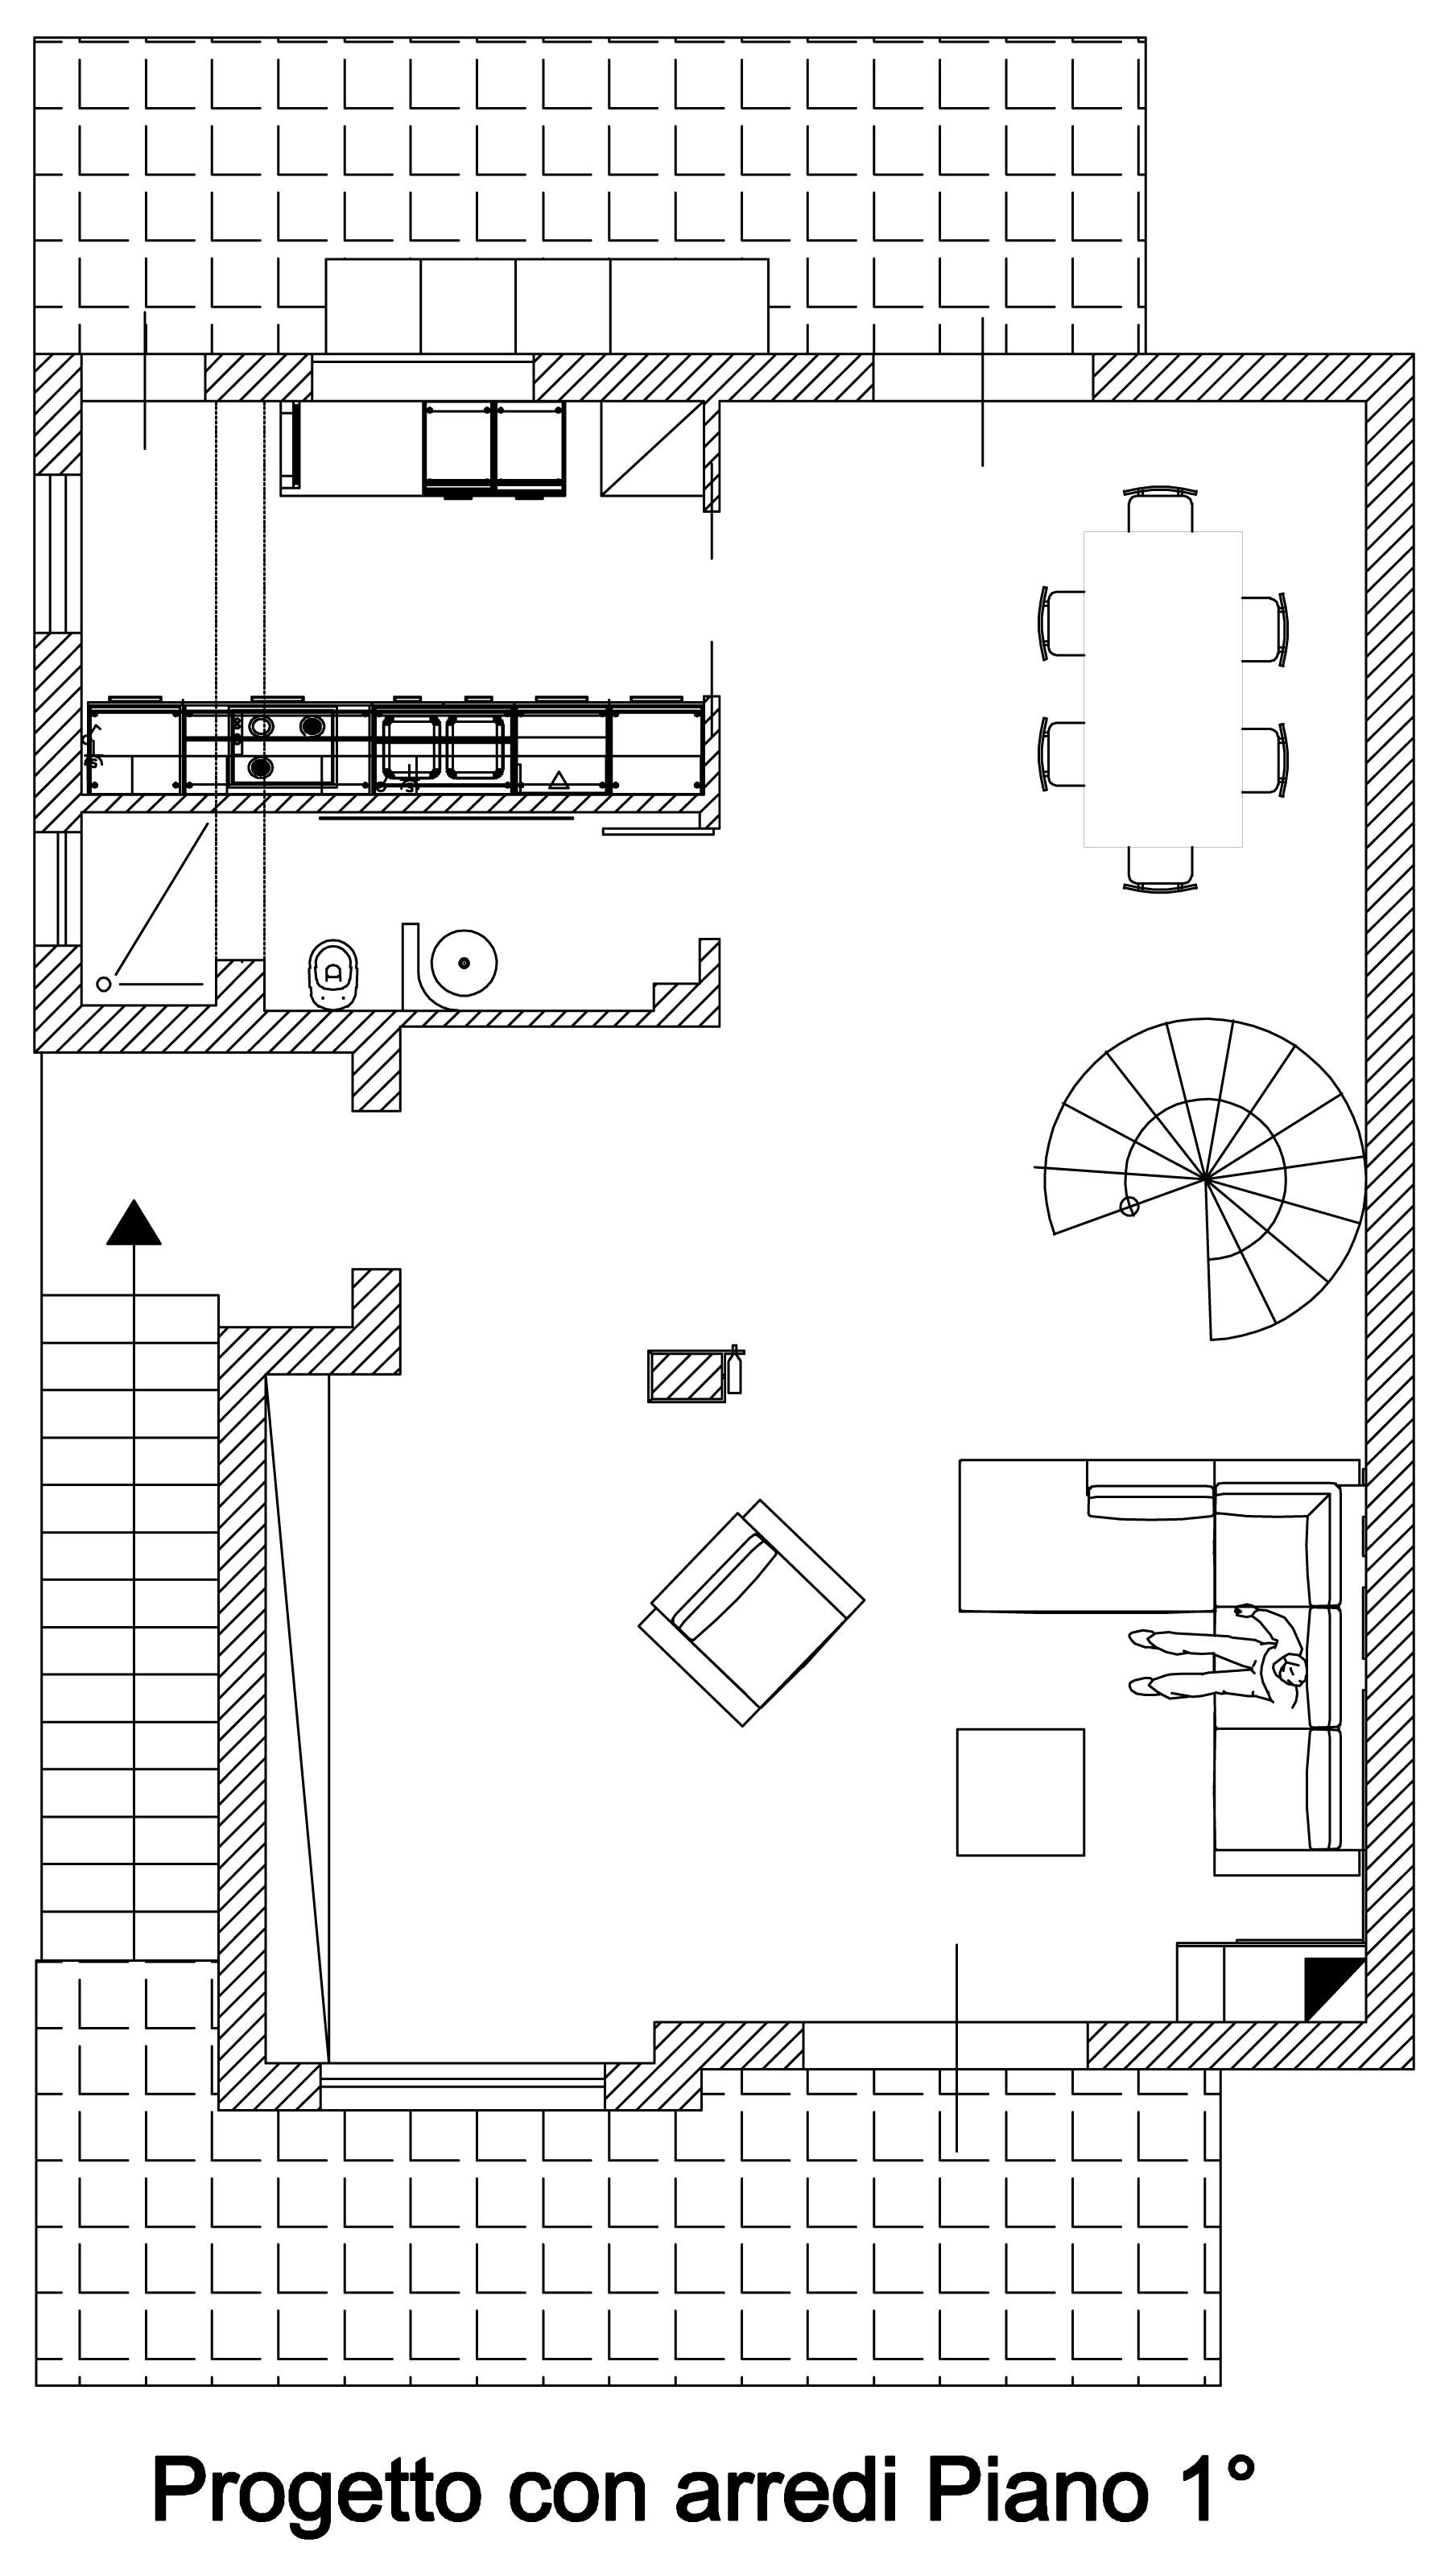 arch-arnone-interior-design-of-unabitazione-of-2-levels-floor-first